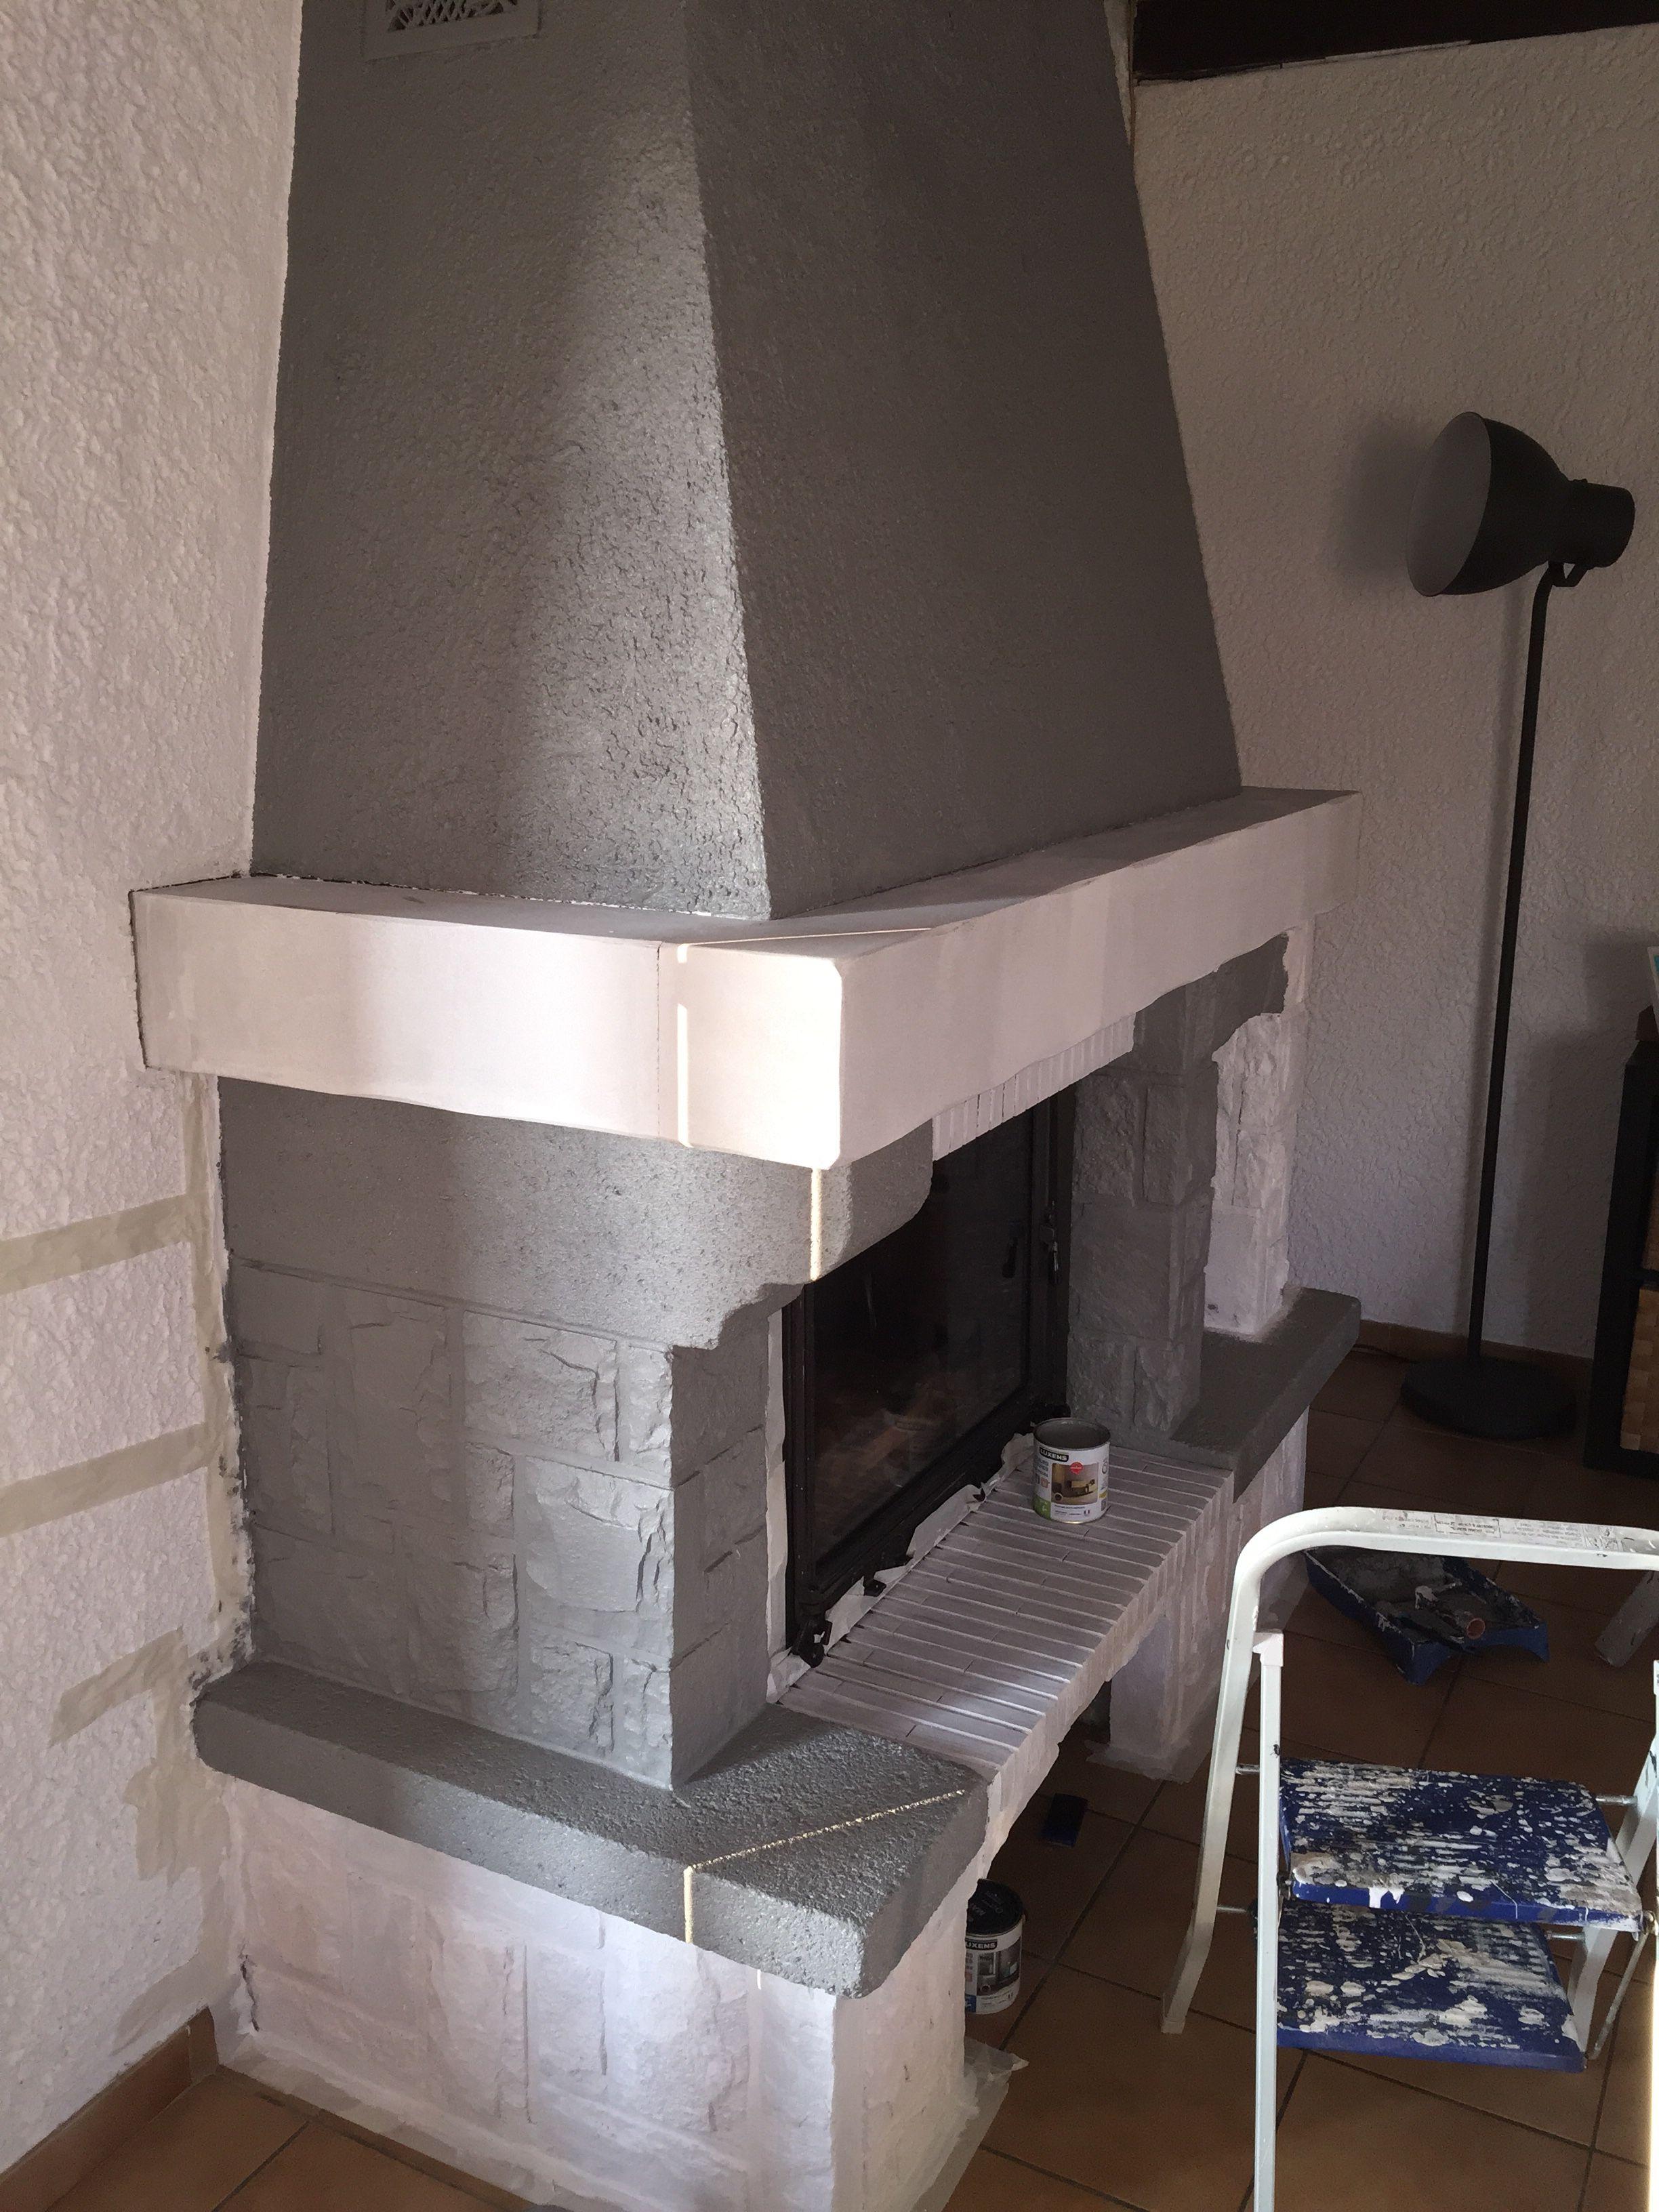 pingl par stephanie piano sur relooking chemin e pinterest chemin e moderniser cheminee. Black Bedroom Furniture Sets. Home Design Ideas